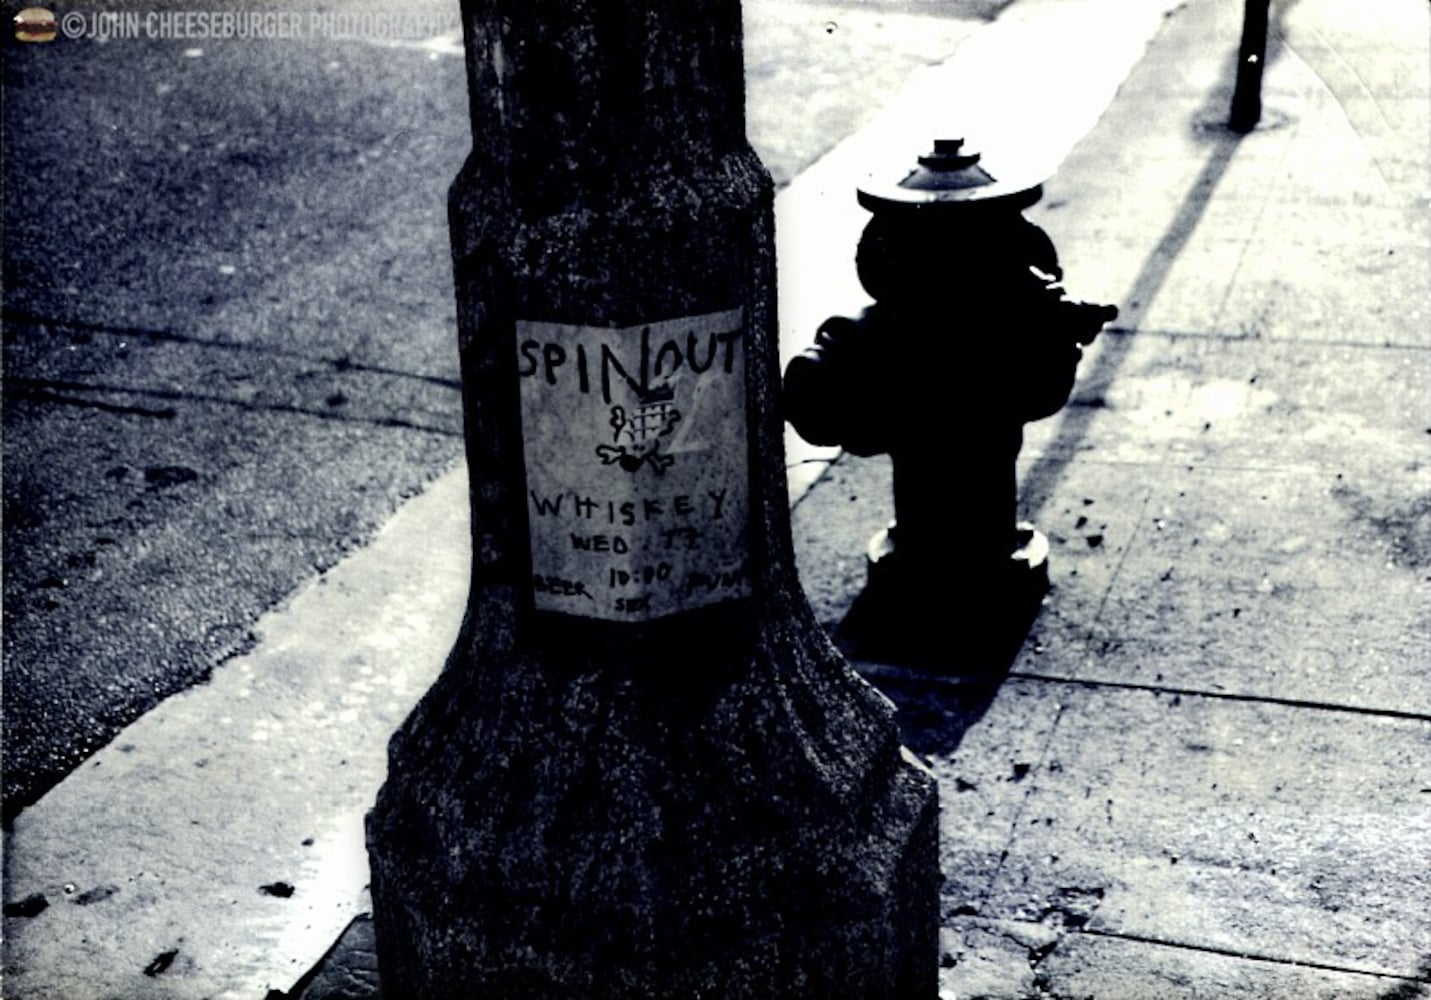 SPINOUT (LosAngeles/1992)  Rollei 35を使って撮影した写真